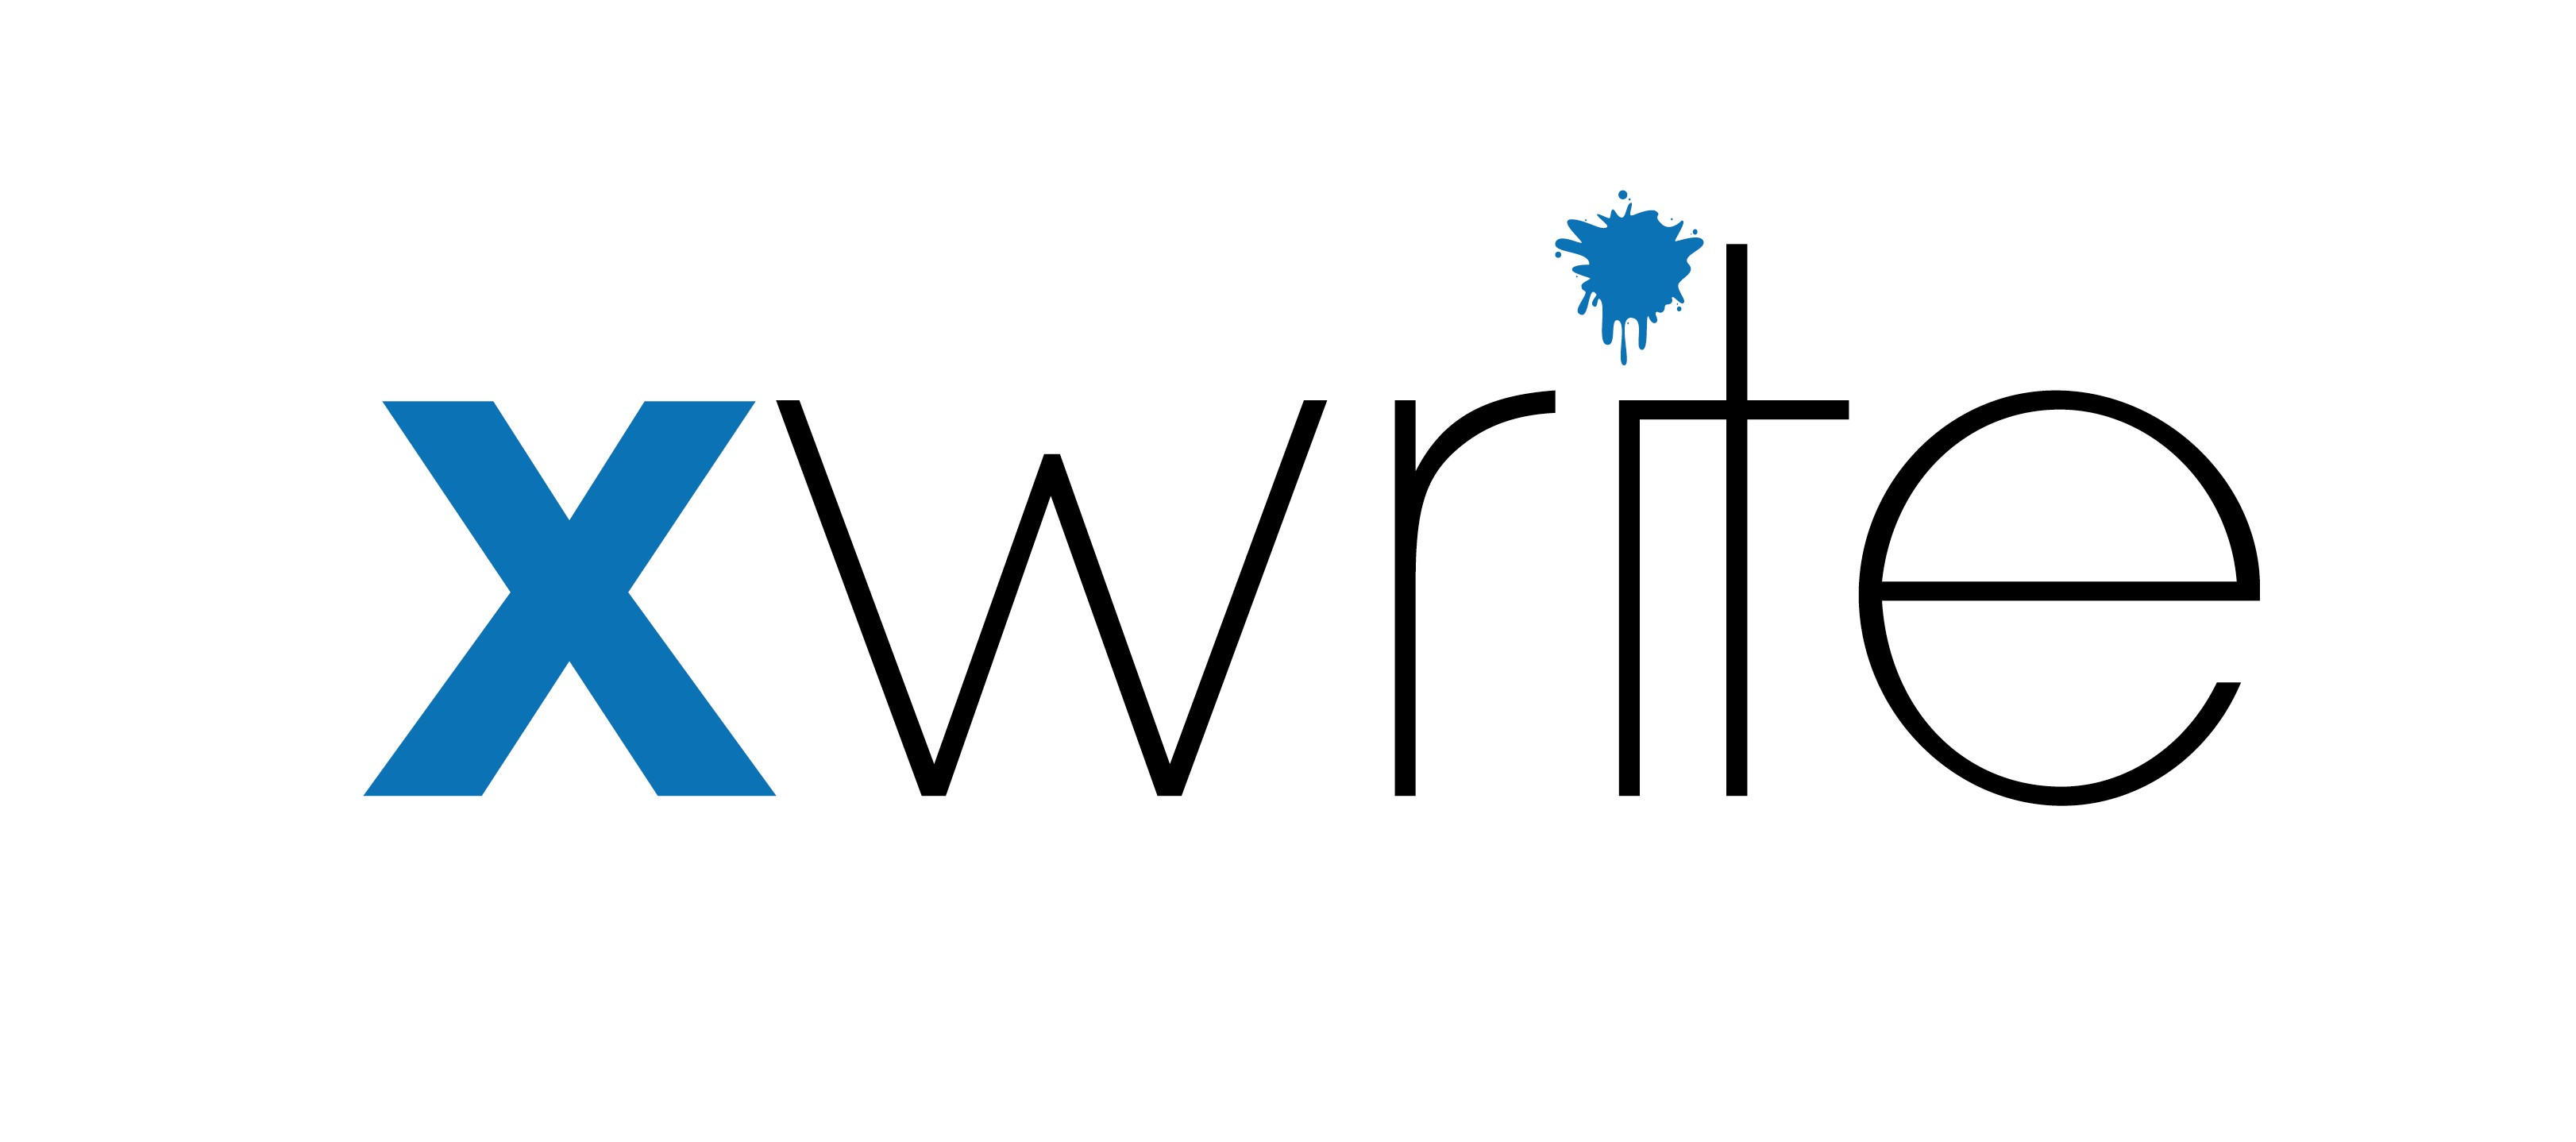 xwrite - Office & more